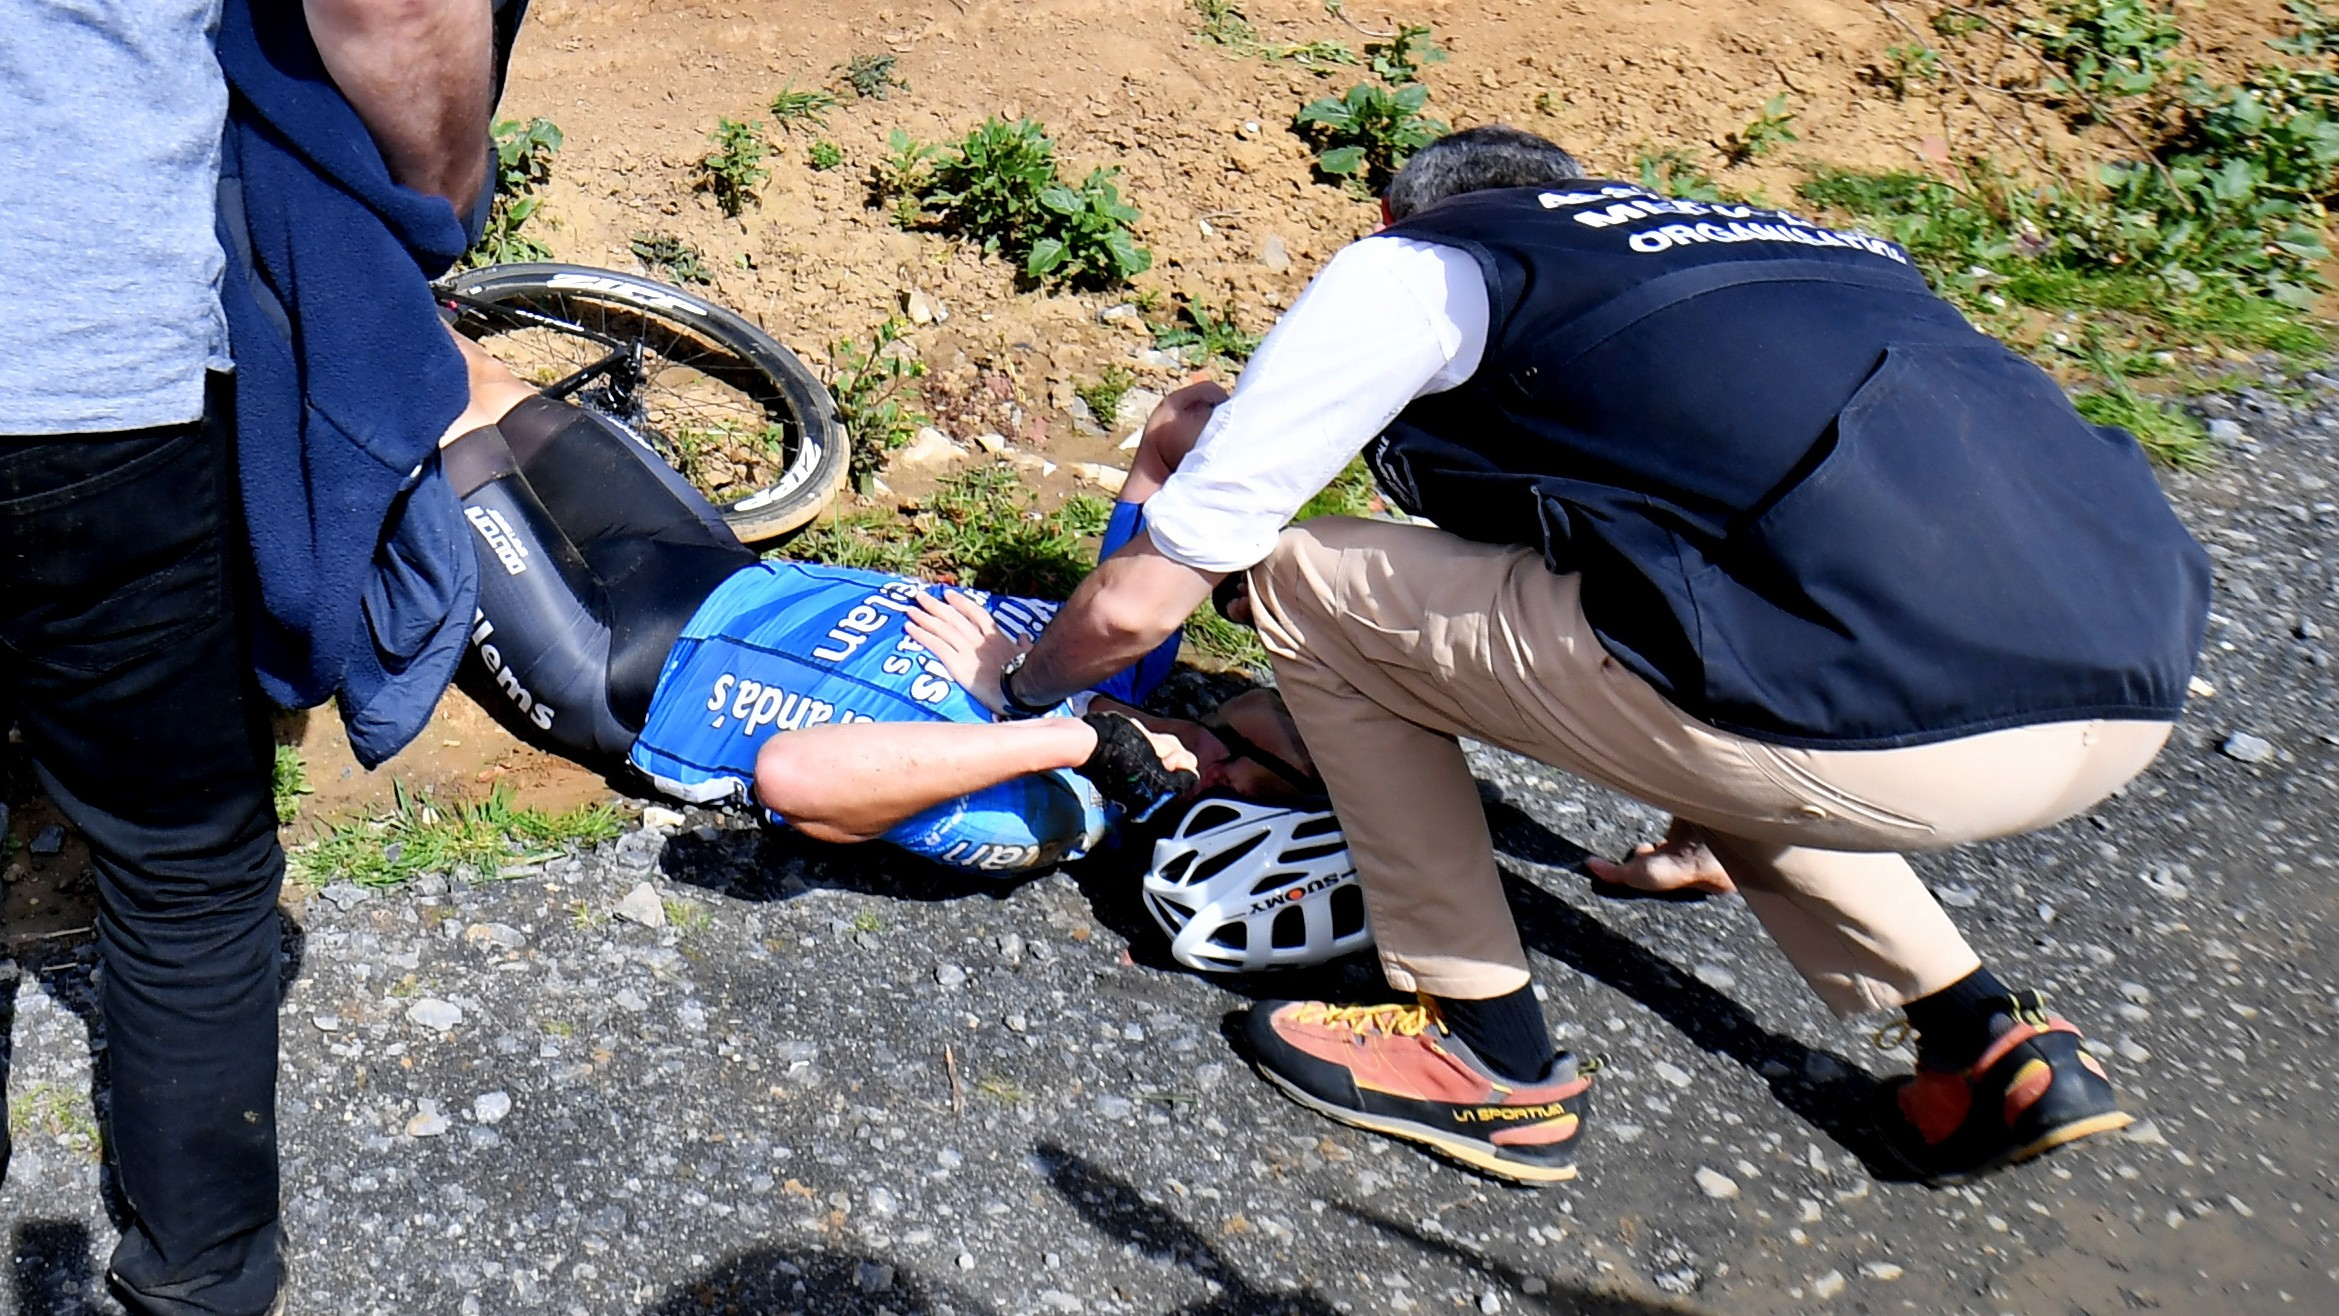 Tragedia alla Parigi-Roubaix. Muore d'infarto il belga Goolaerts